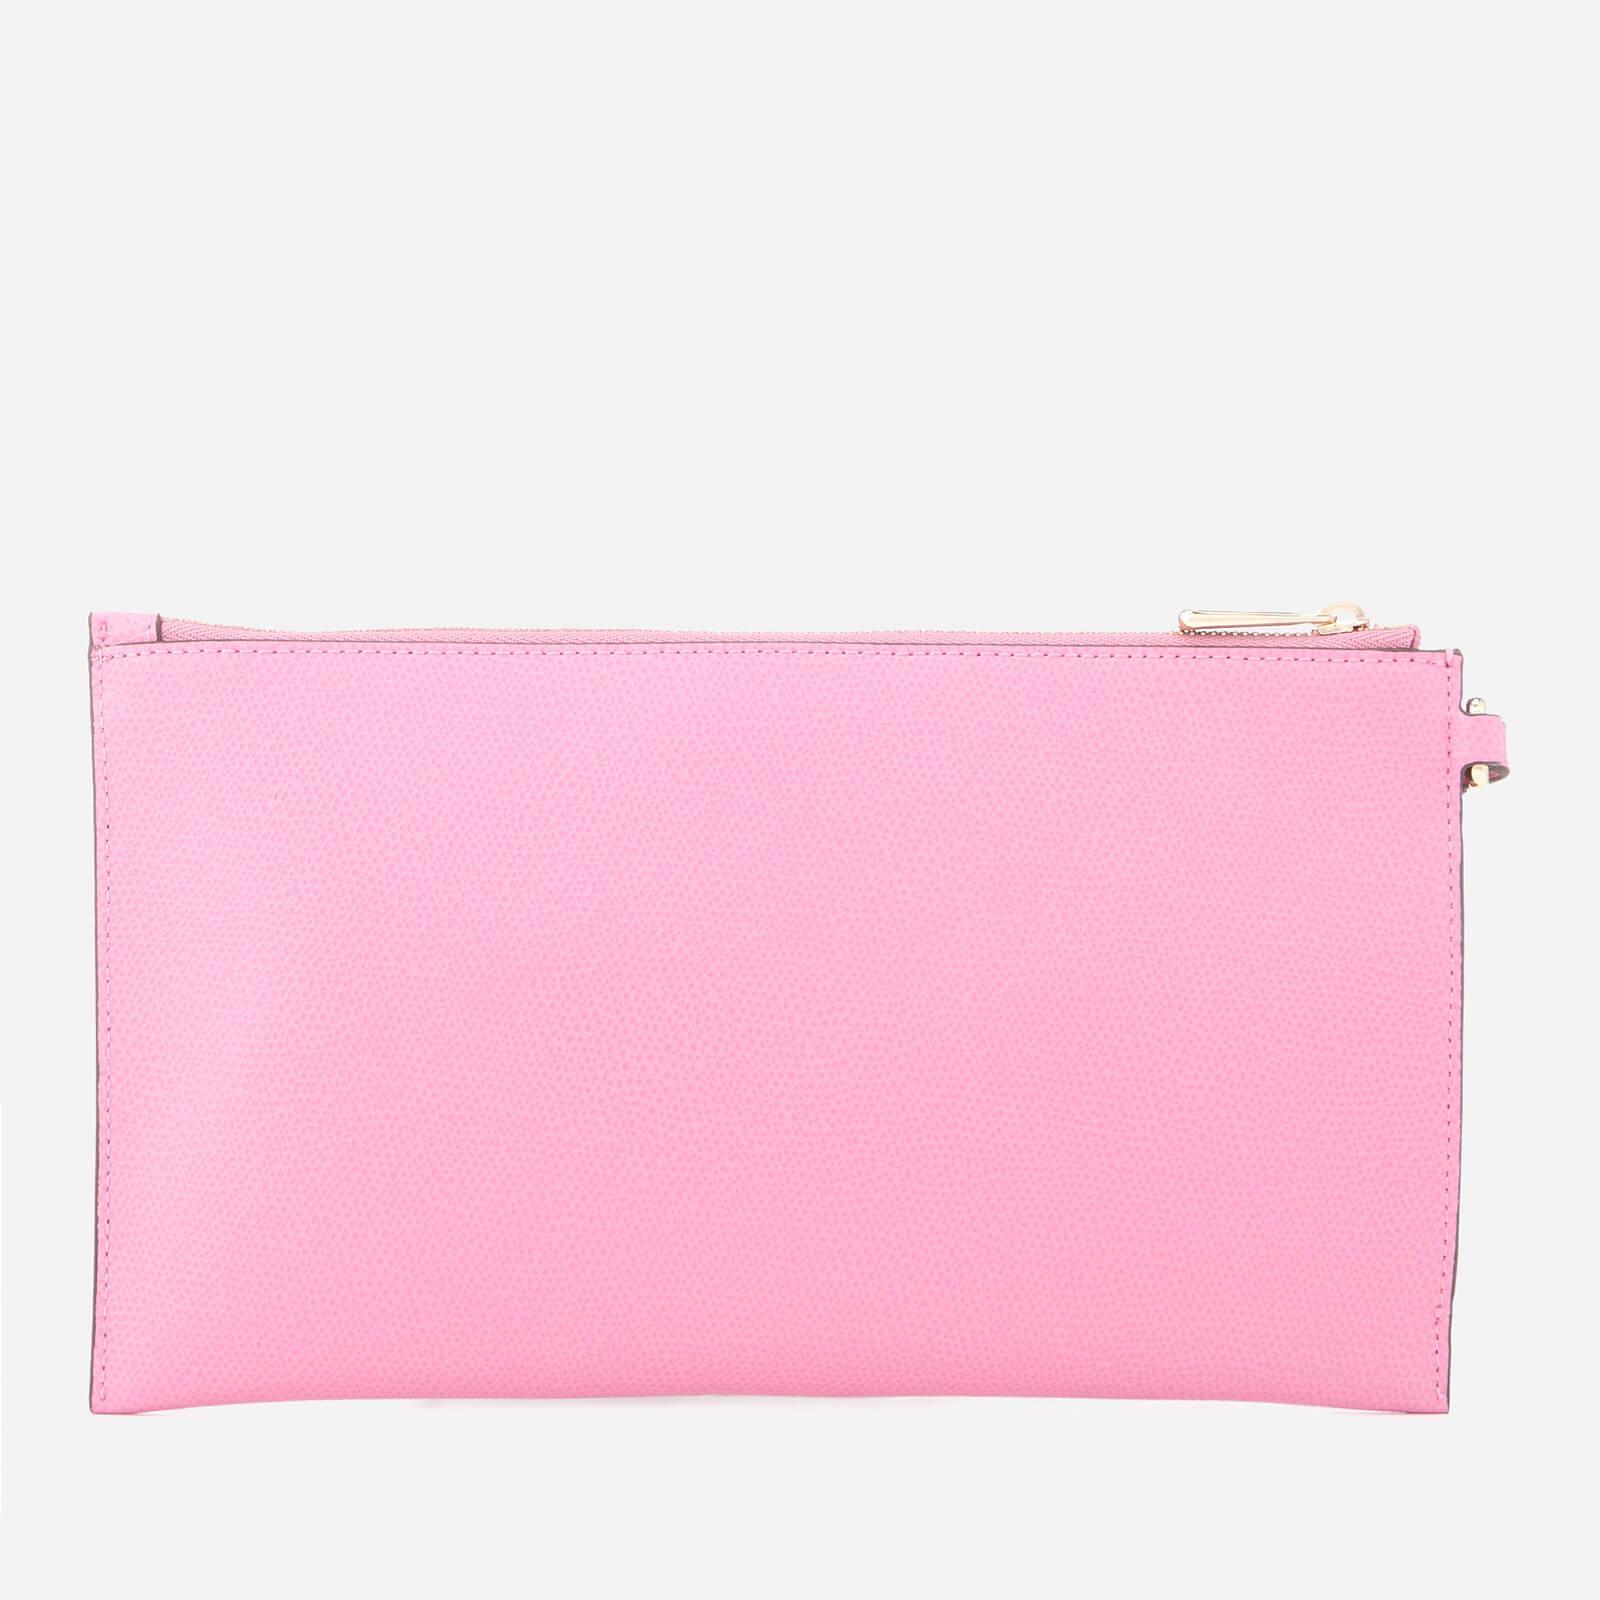 Sale The Cheapest Babylon large clutch - Pink & Purple Furla Sale 2018 b1MPx